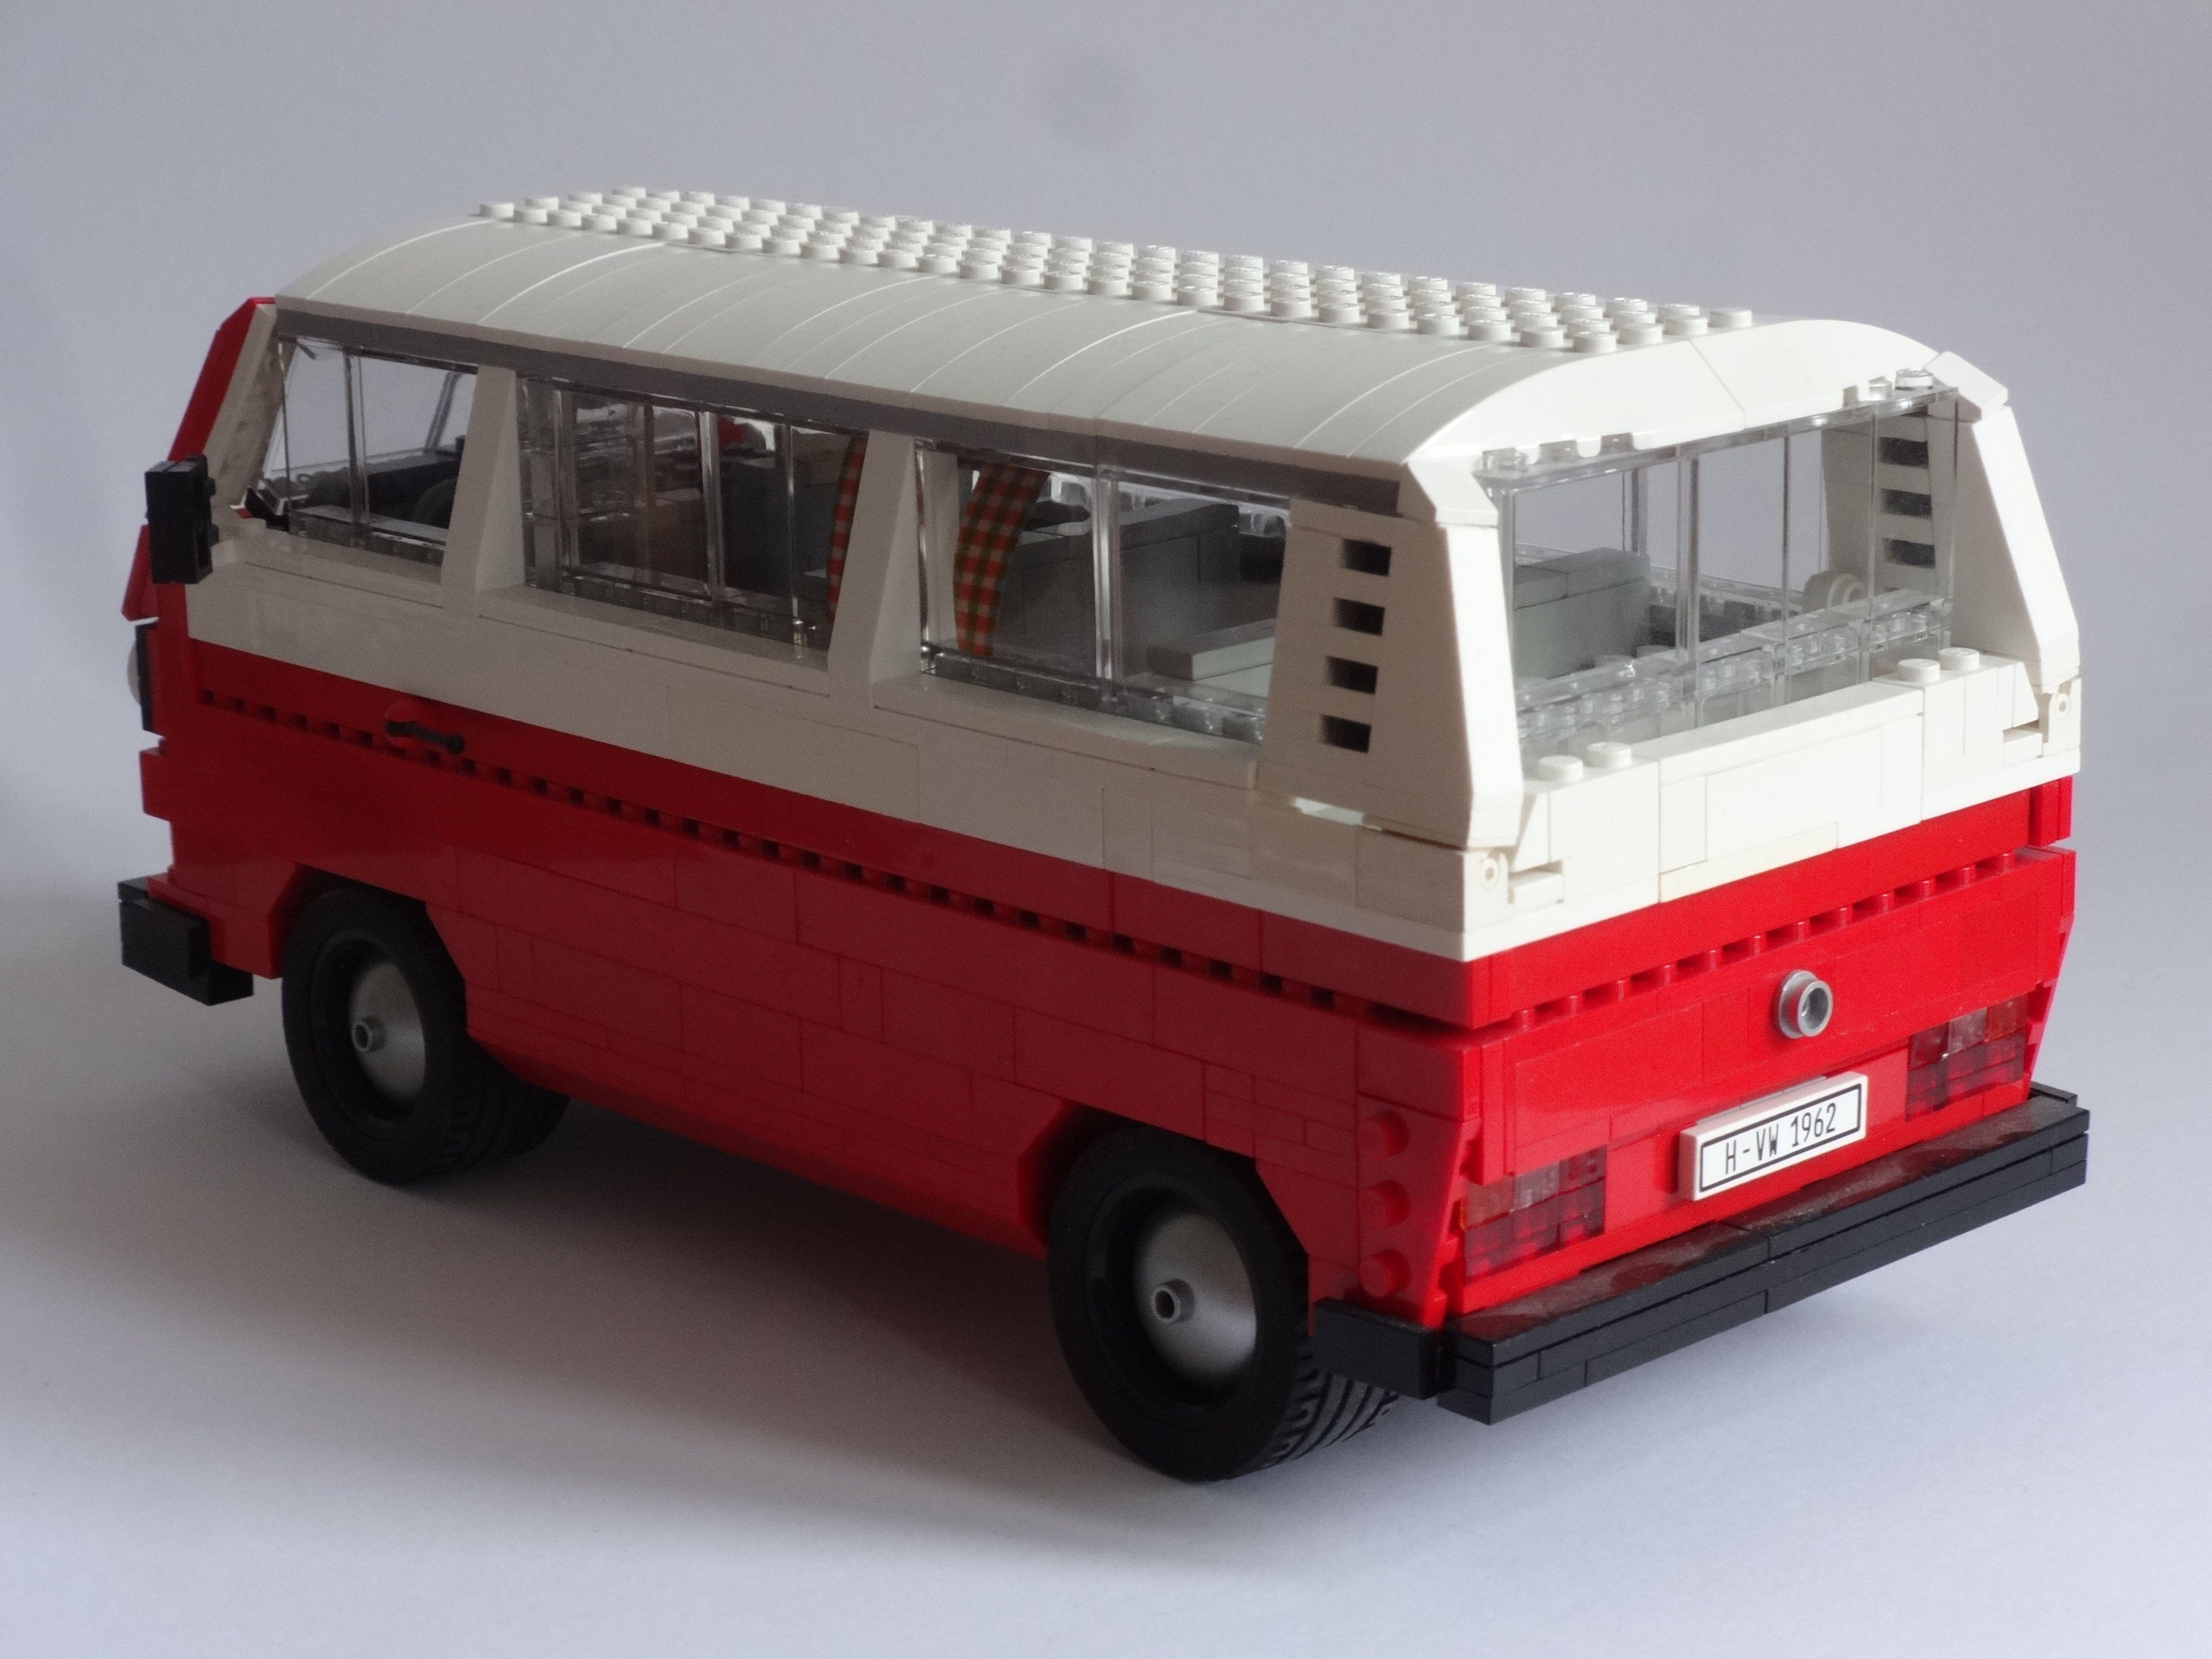 lego vw t3 lego technic modelle lego lkw lego. Black Bedroom Furniture Sets. Home Design Ideas